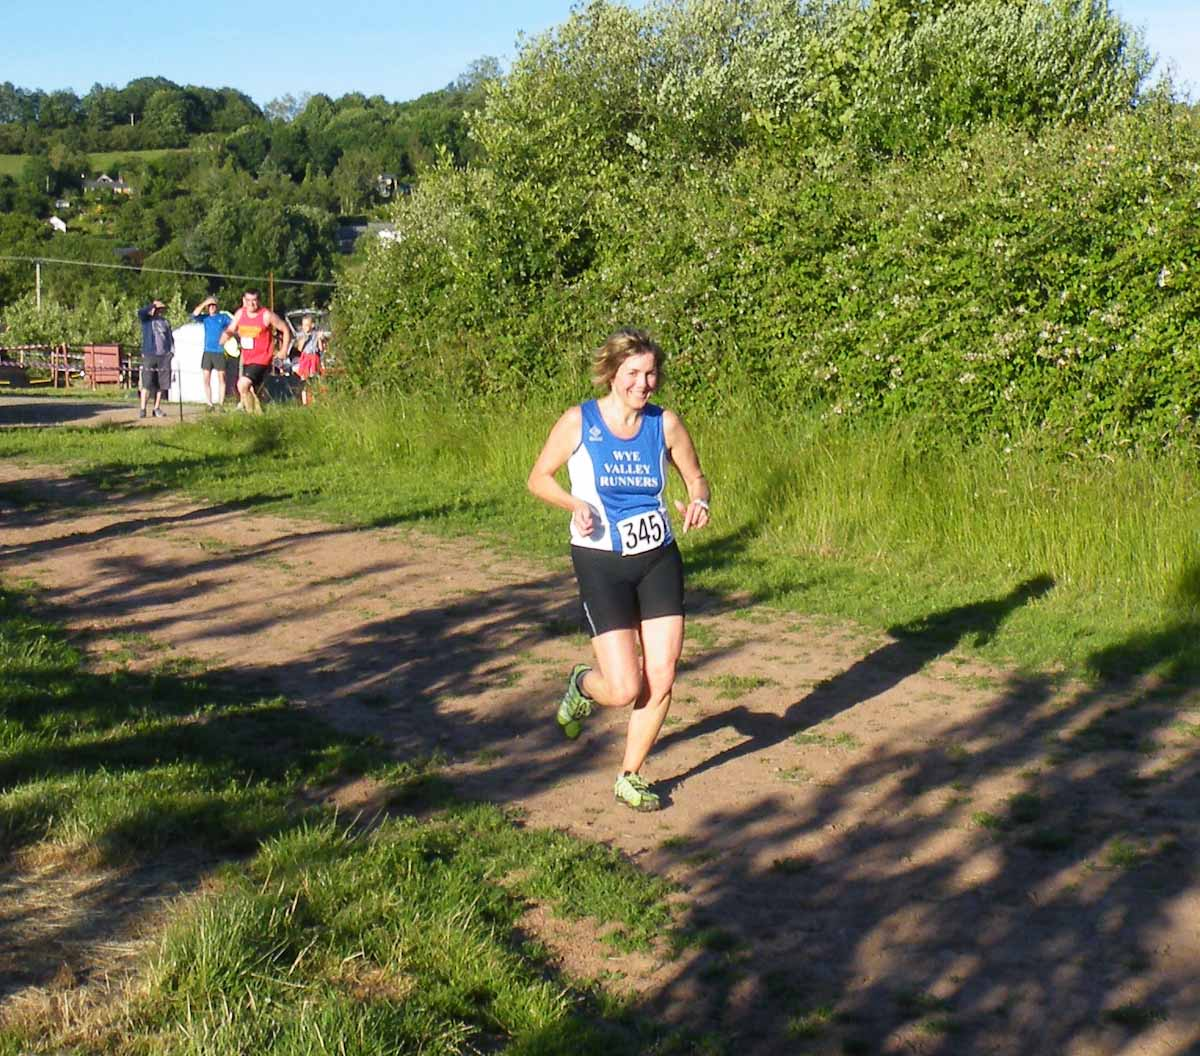 Wye Vally Runners-1.jpg